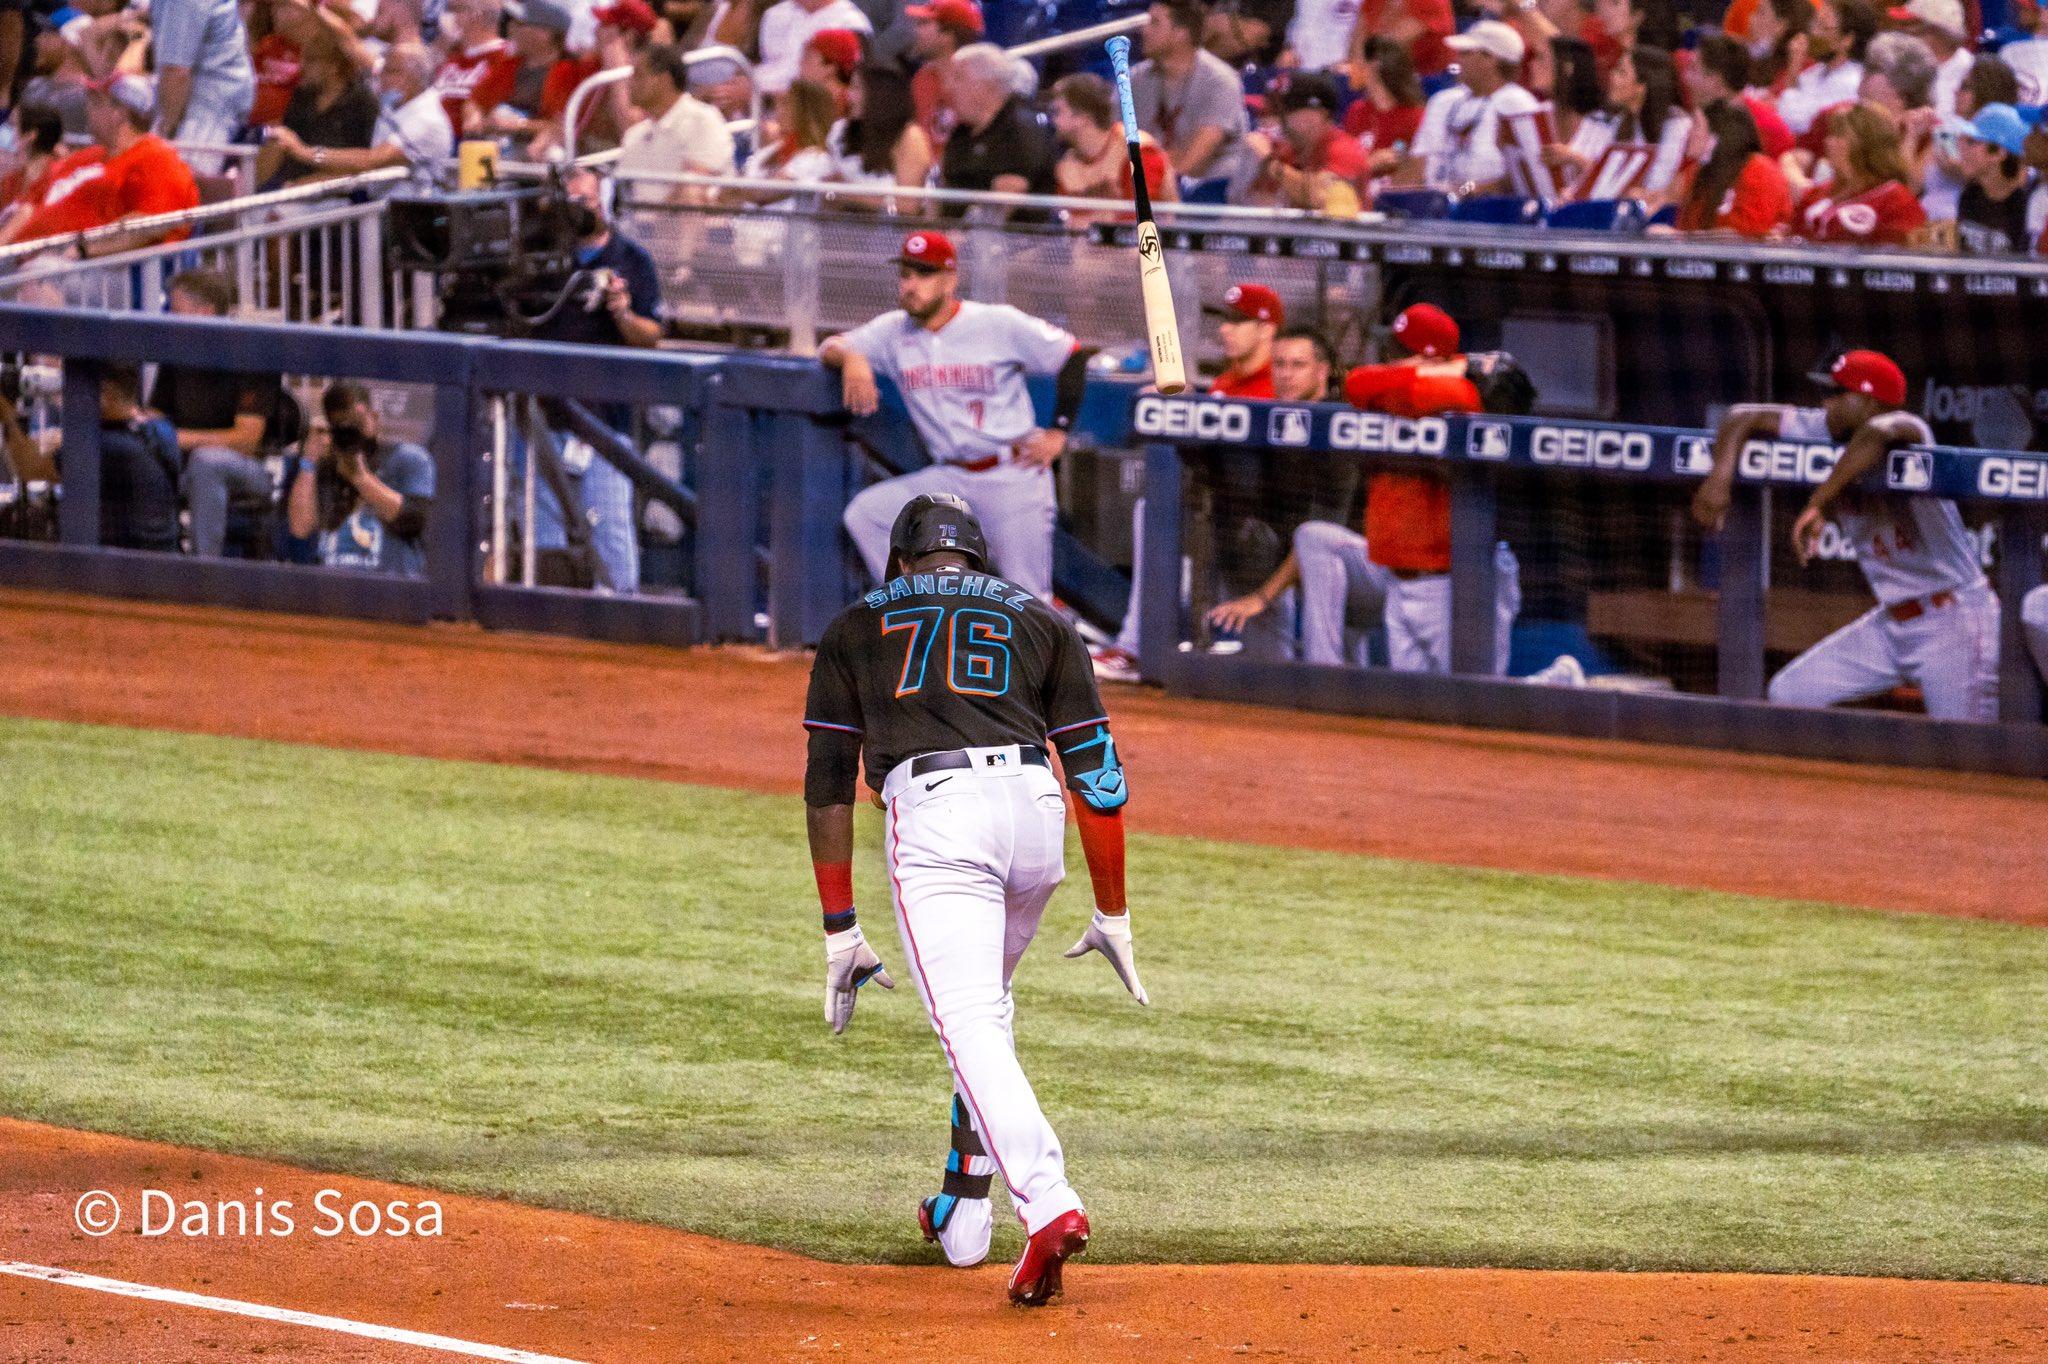 Marlins outfielder Jesús Sánchez flips his bat after hitting a home run